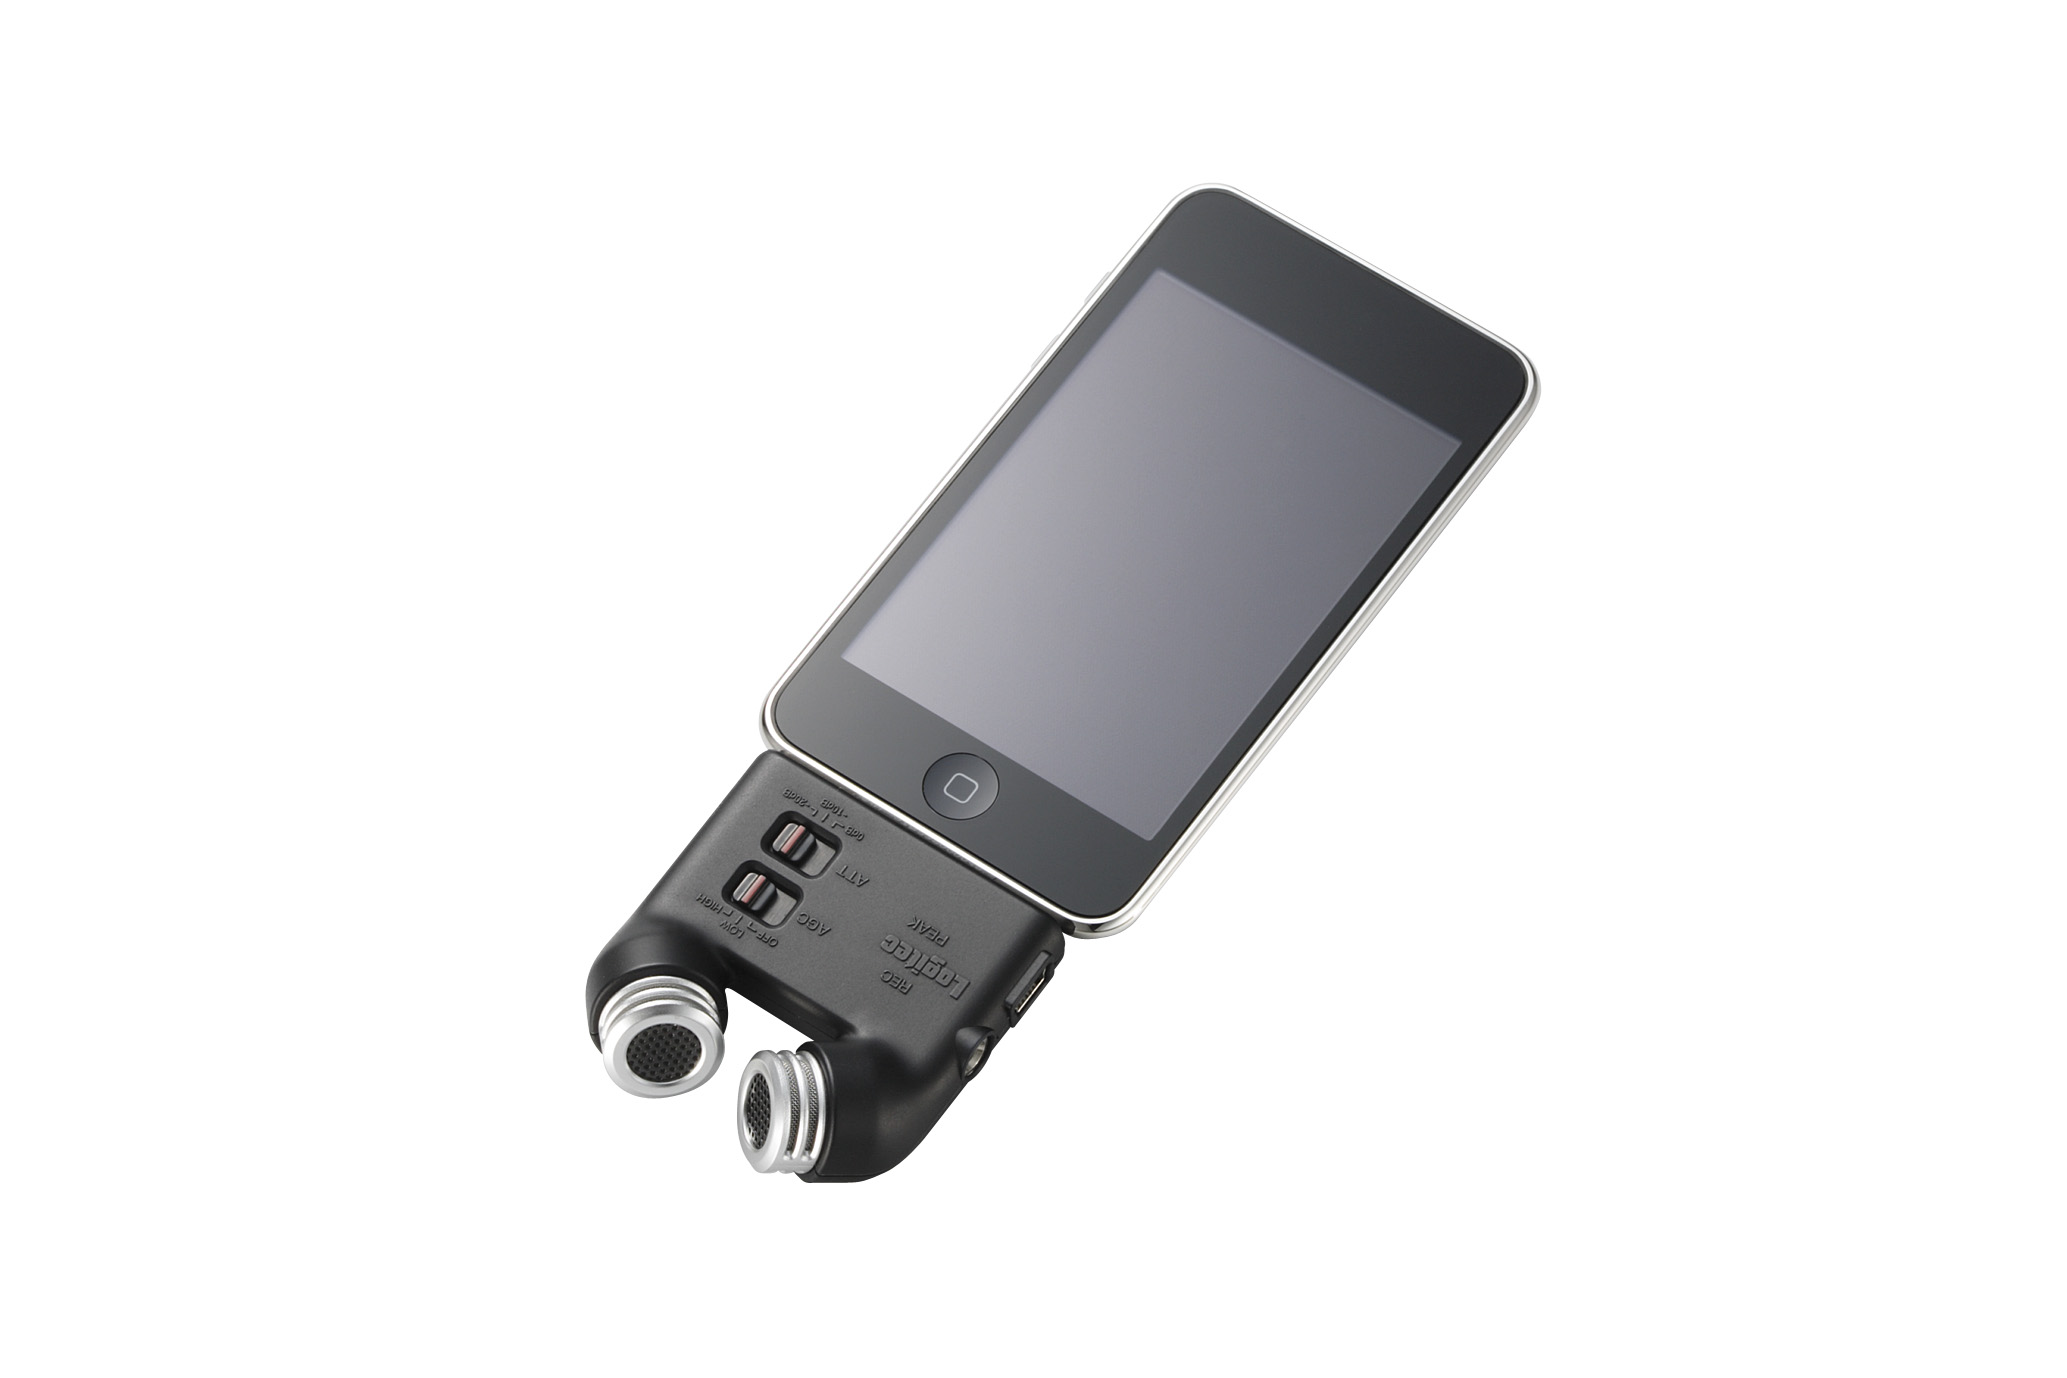 ▲iPhoneに高性能マイクを装着したところ http://www.logitec.co.jp/press/photo/photo_350/licirec03p_31.jpg より